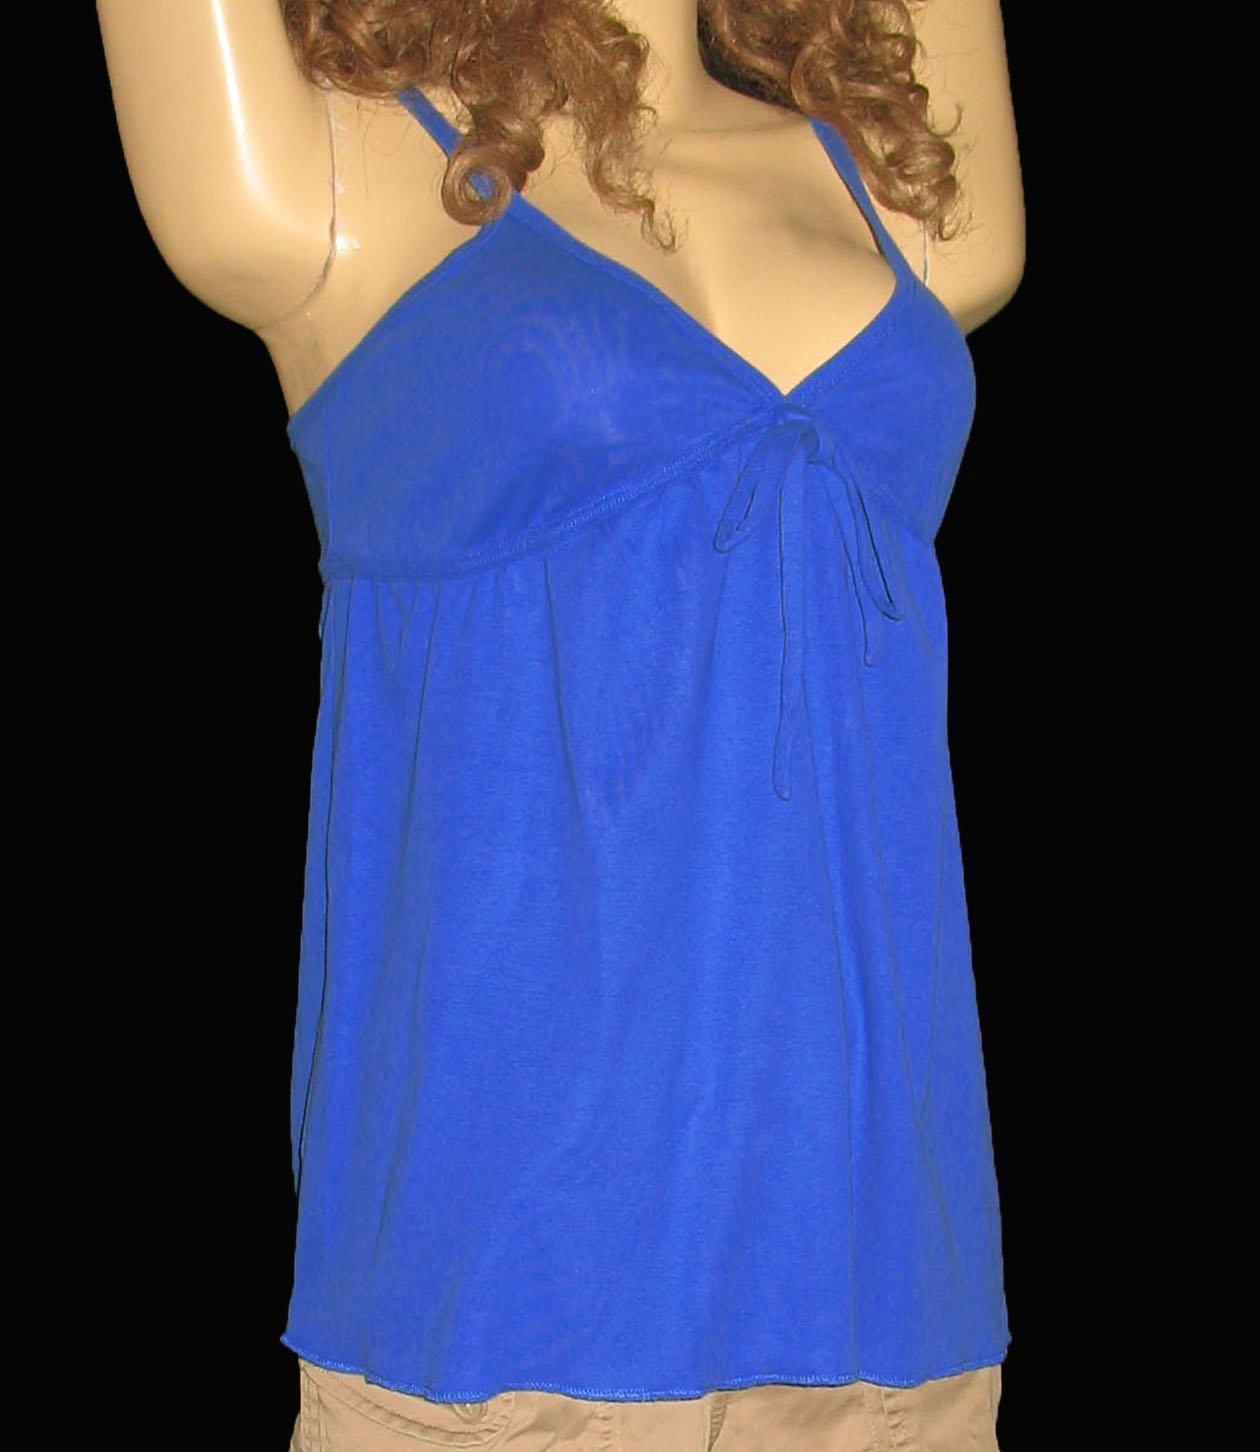 Victoria's Secret Blue Babydoll Cami Tank Top Size Medium 184292